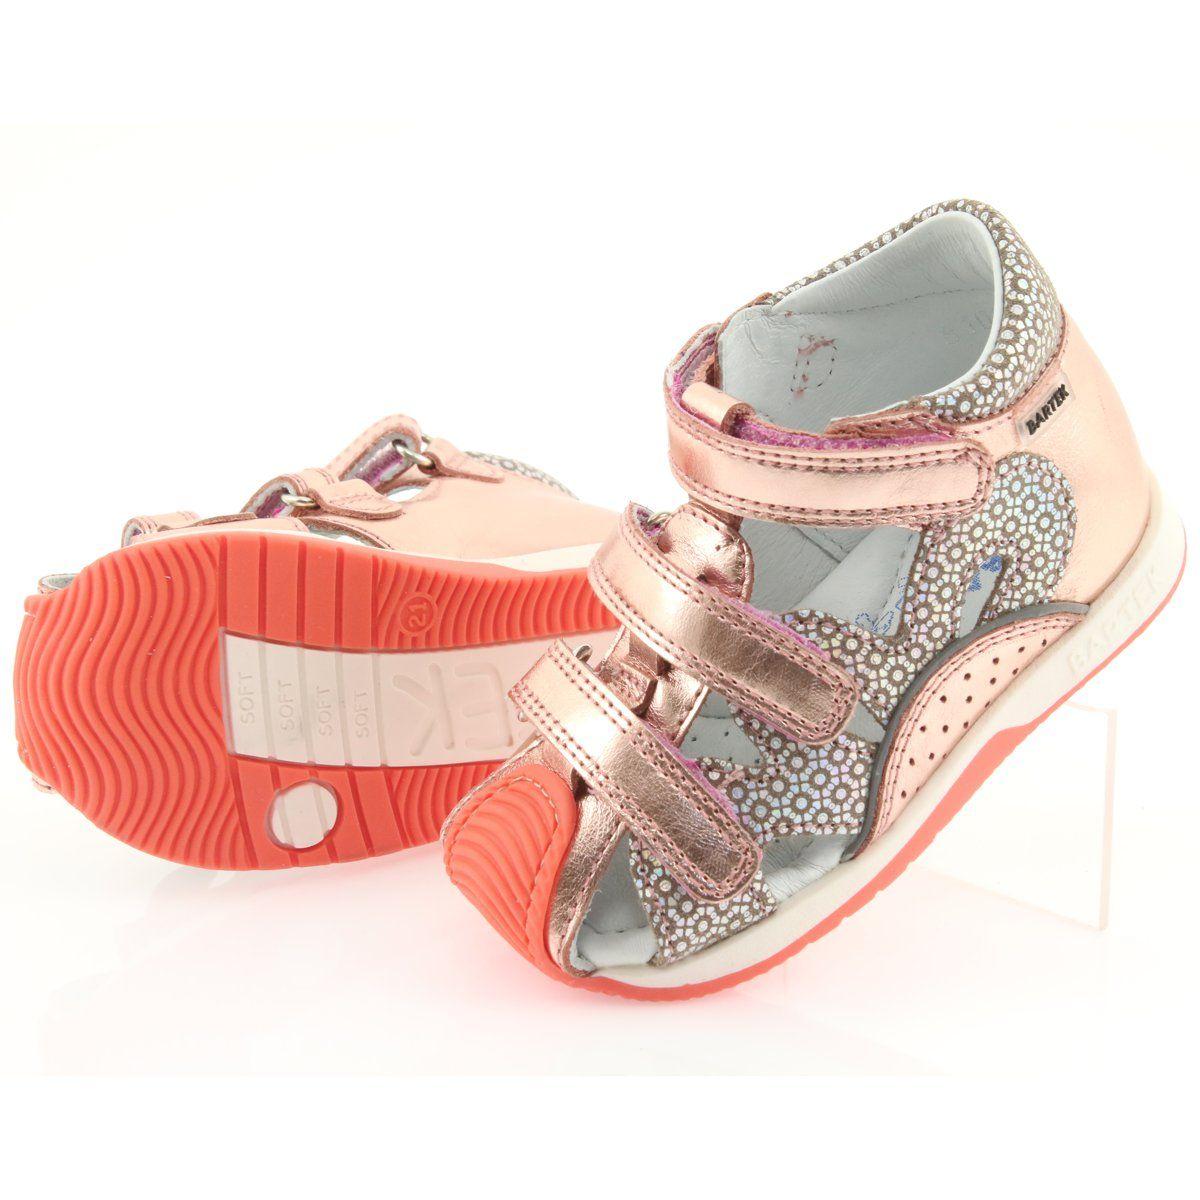 Bartek 81021 Sandalki Rozowe Zloto Pomaranczowe Szare Zolte Girls Shoes Childrens Shoes Kid Shoes